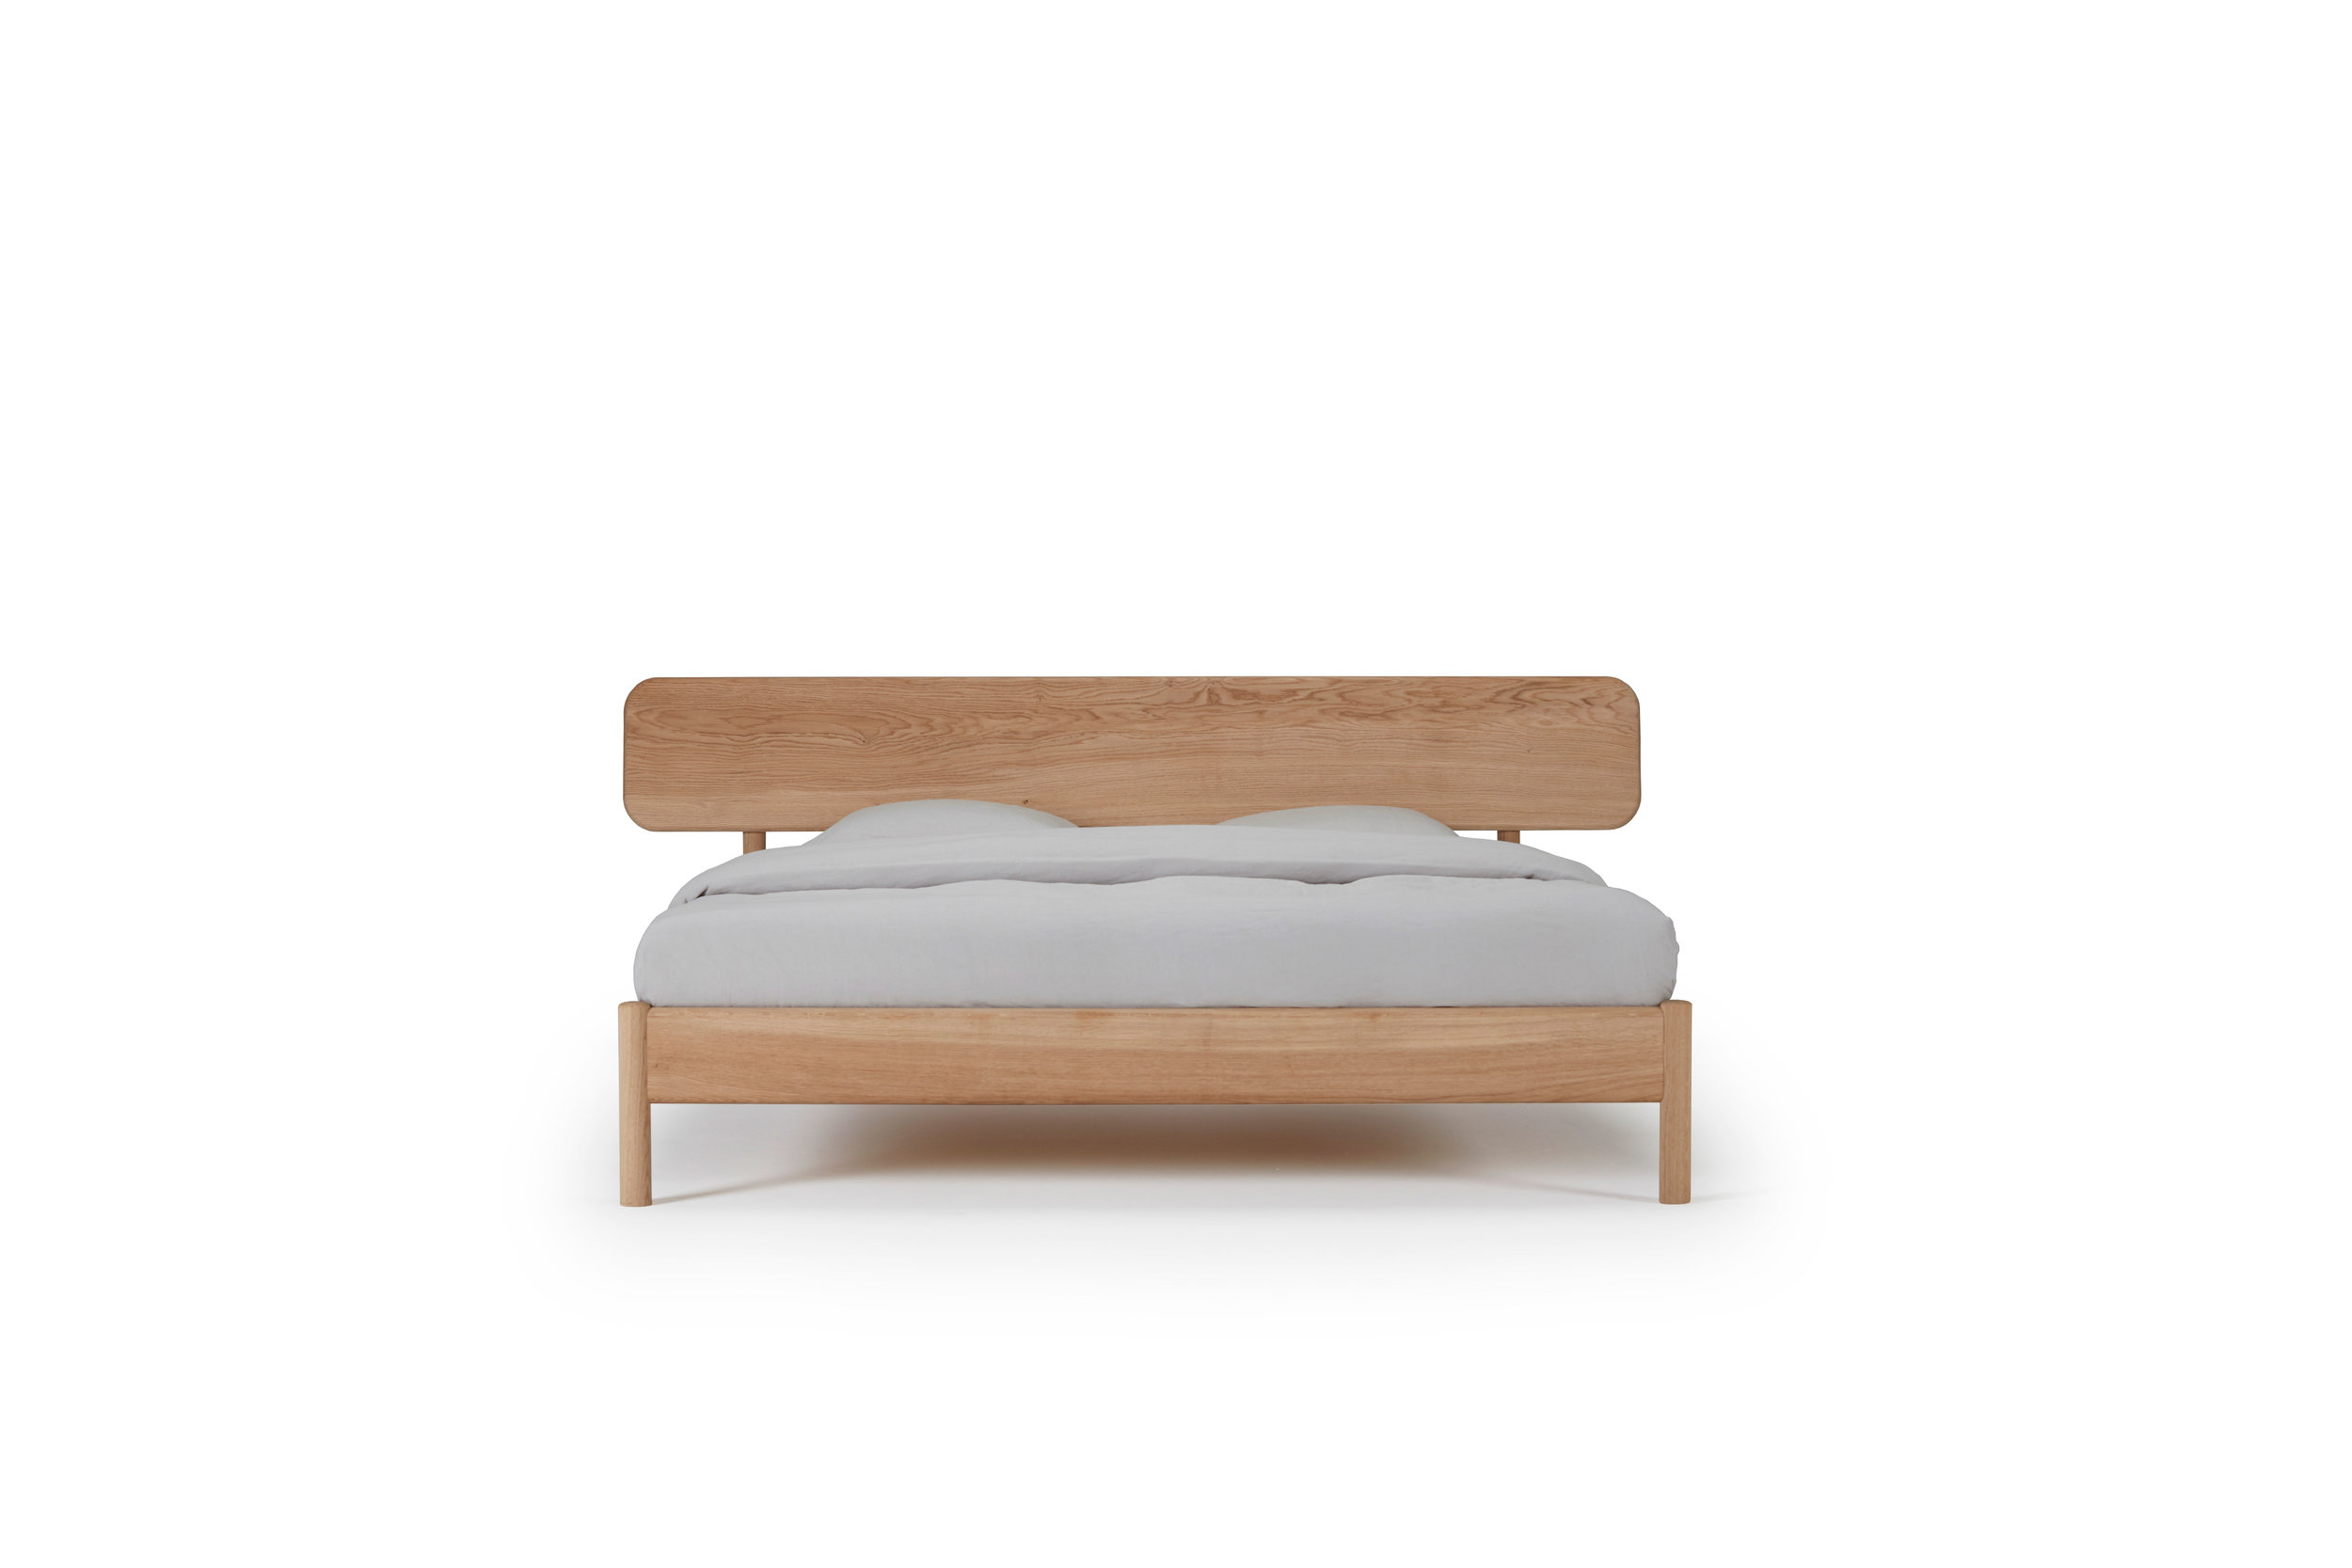 3---ALKEN-BED---RE-BEDS---DESIGN-BY-OLIVER-&-LUKAS-WEISSKROGH.jpg